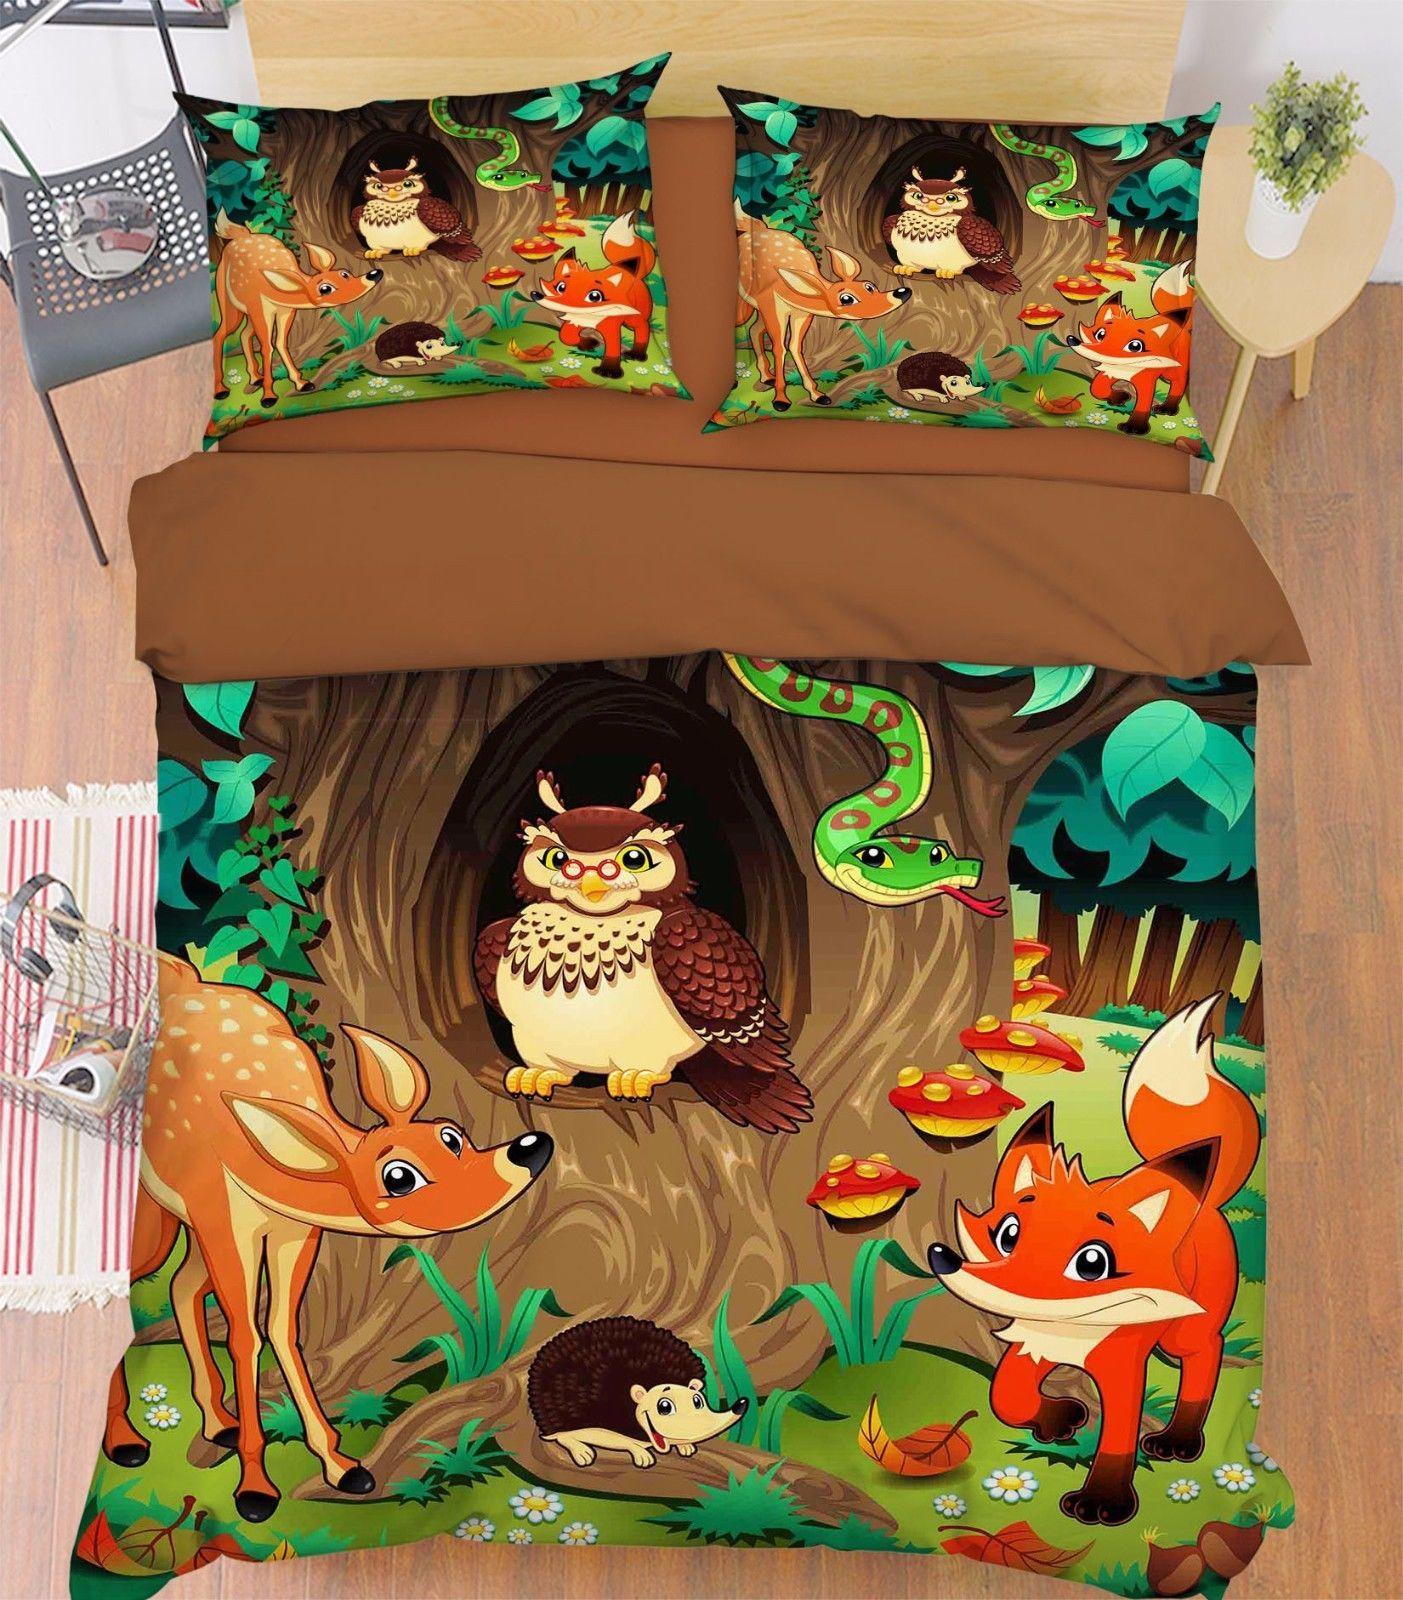 3D Animals 279 Bed Pillowcases Quilt Duvet Cover Set Single Queen King Size AU - $90.04 - $122.20